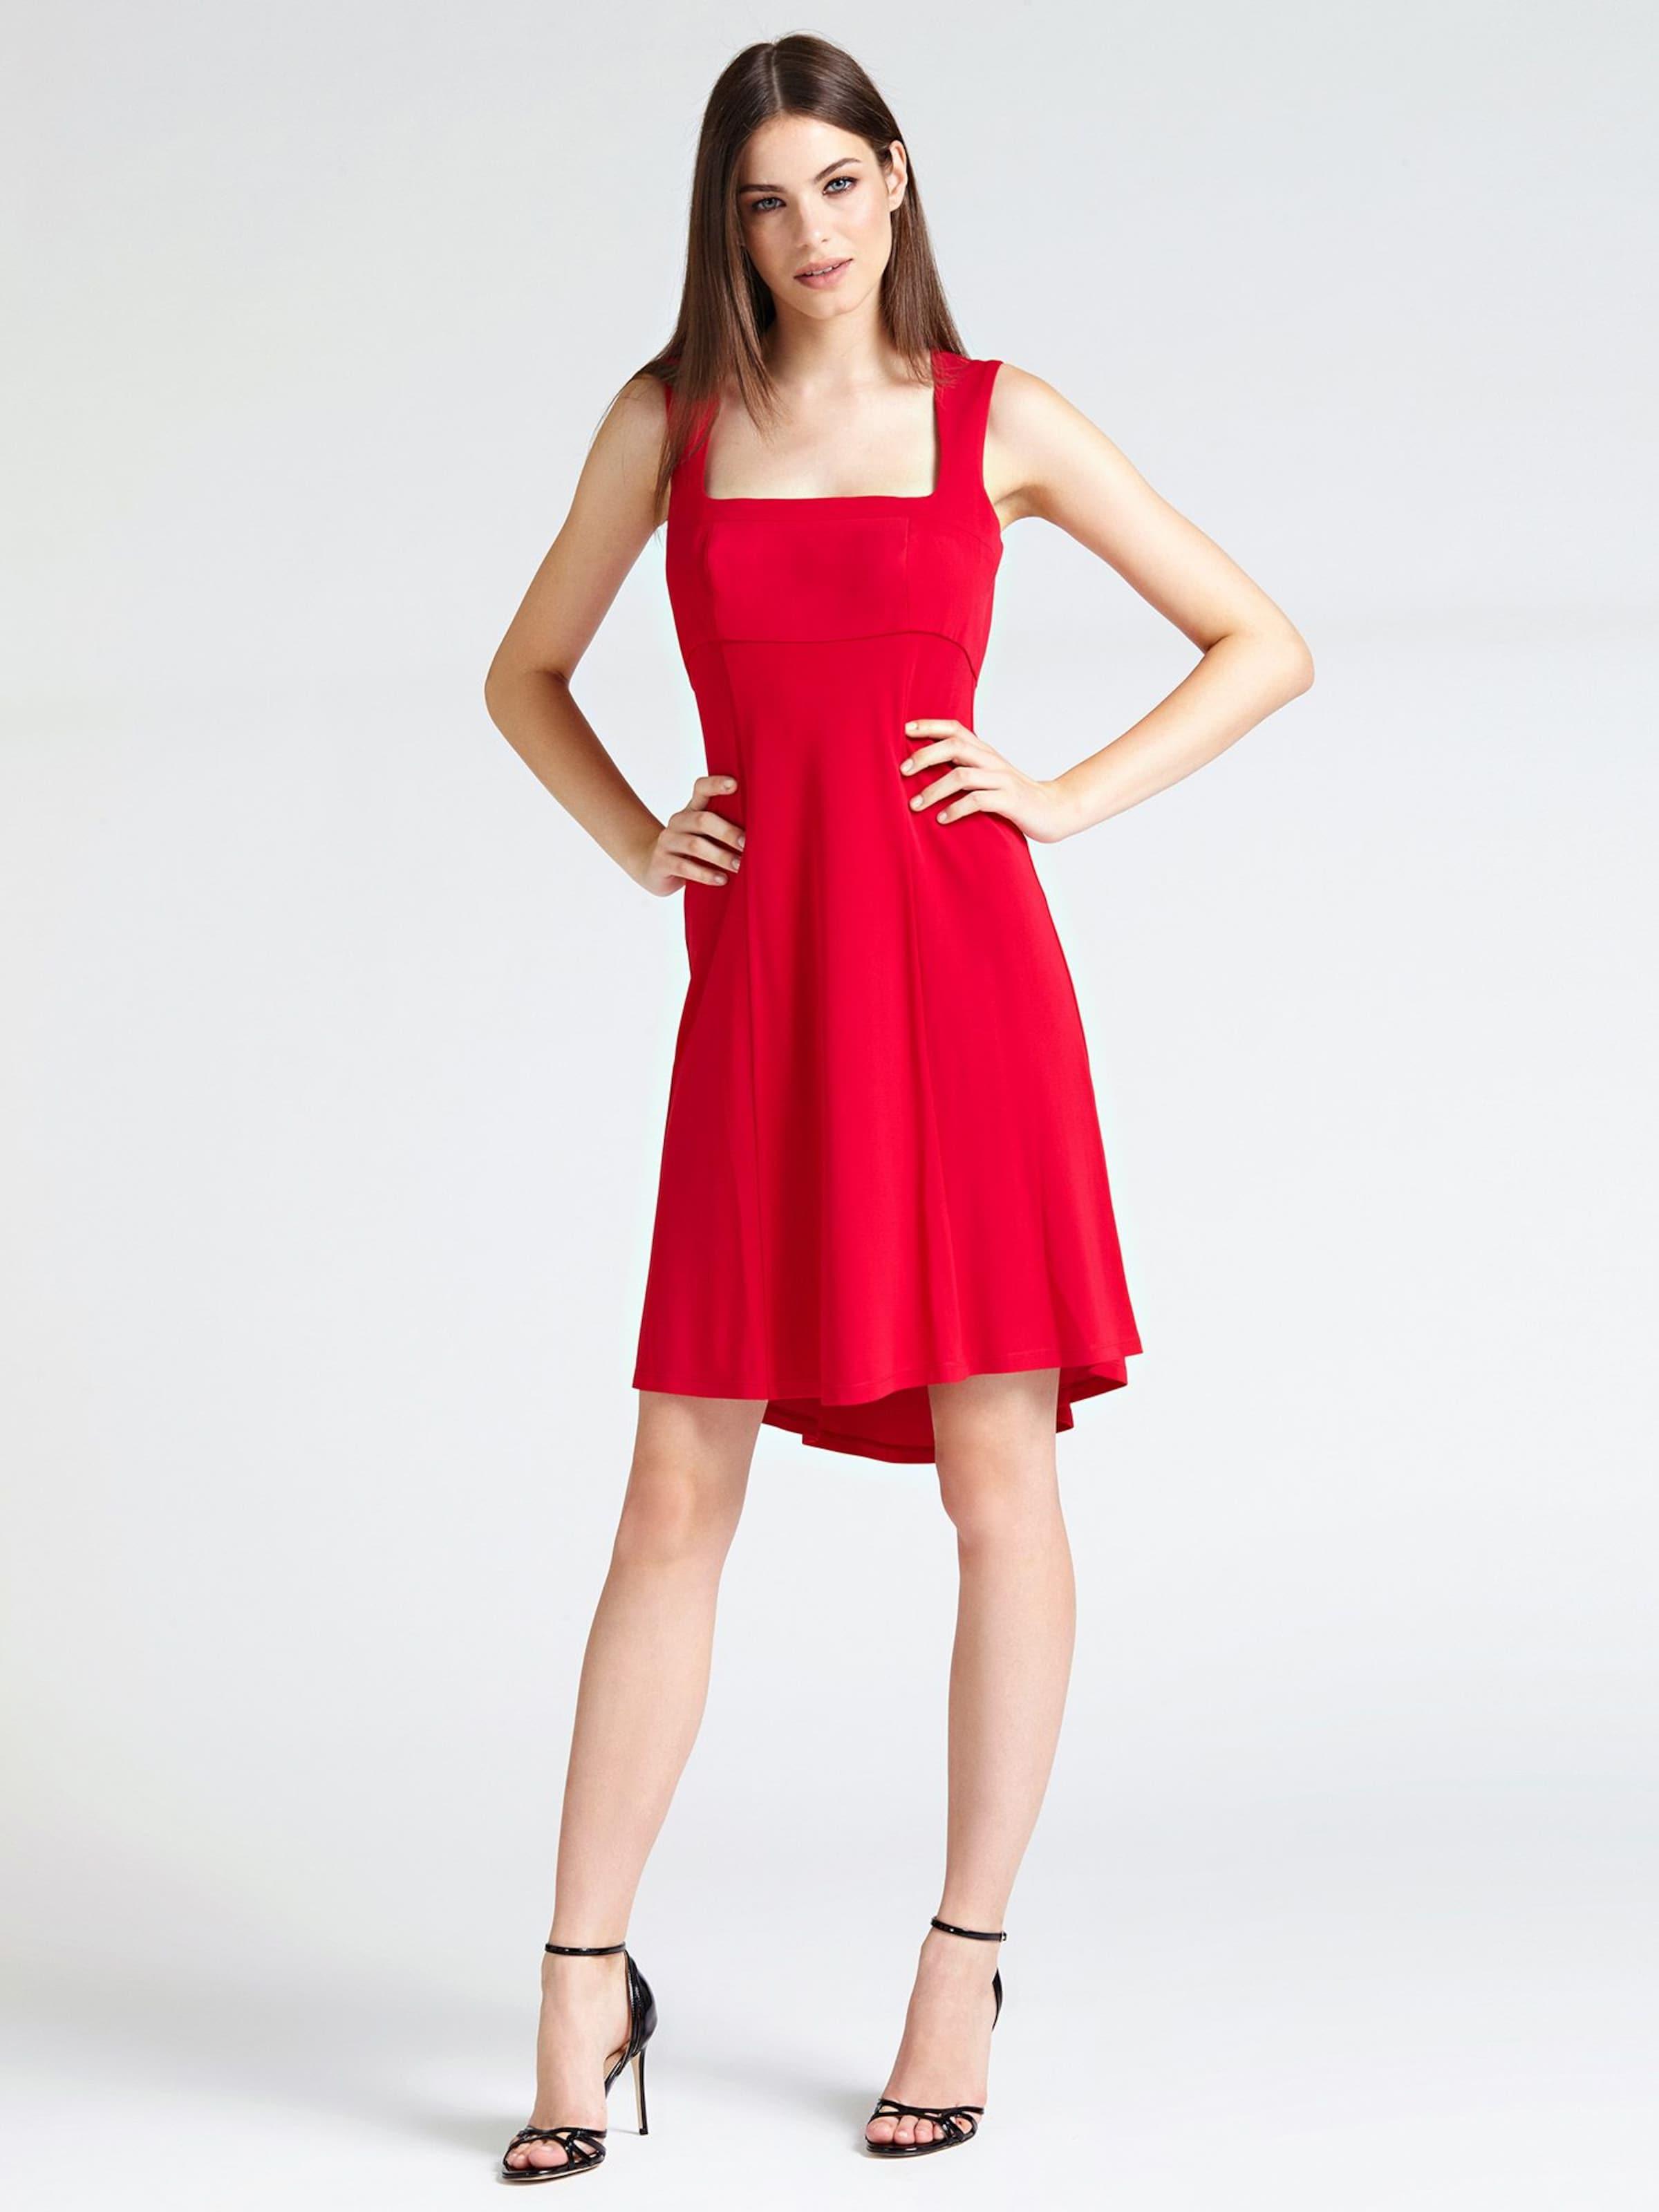 Los Angeles Kleid In Marciano Rot nm8w0OyvN